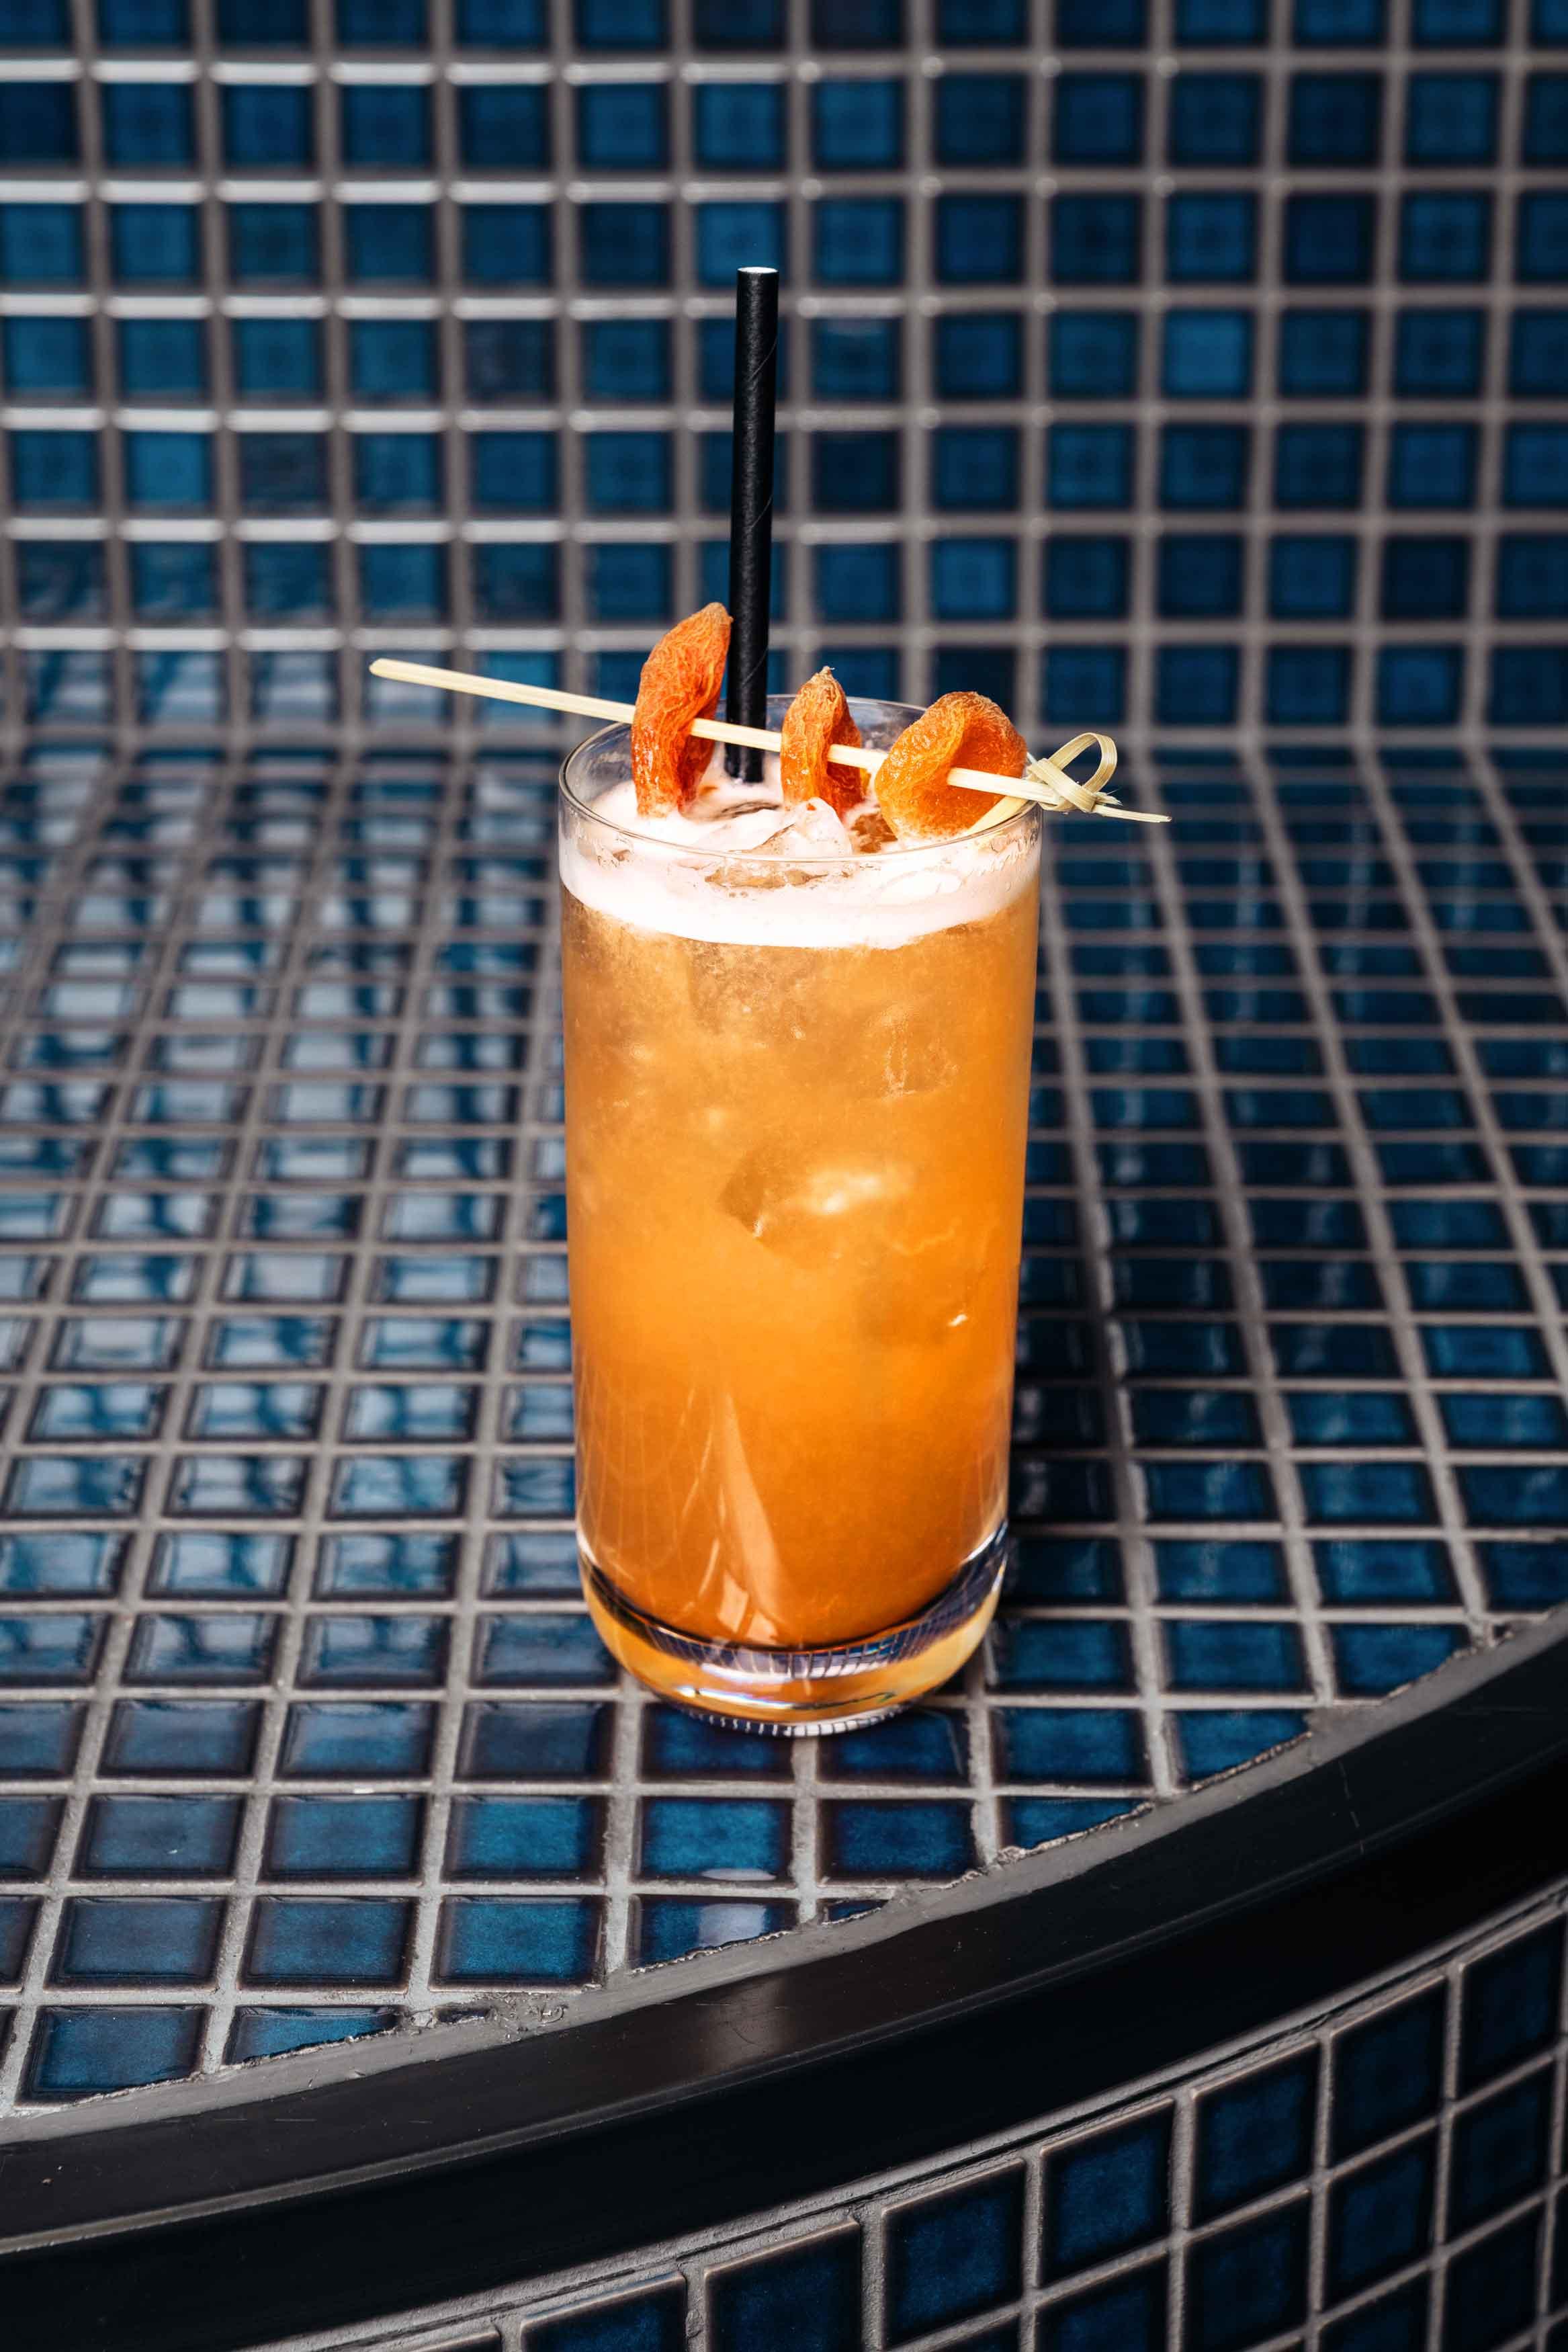 Orange-Cocktail-Jim-and-tonic-kraft-dalston-kraftdalston-german-kraft-distillery-brewery